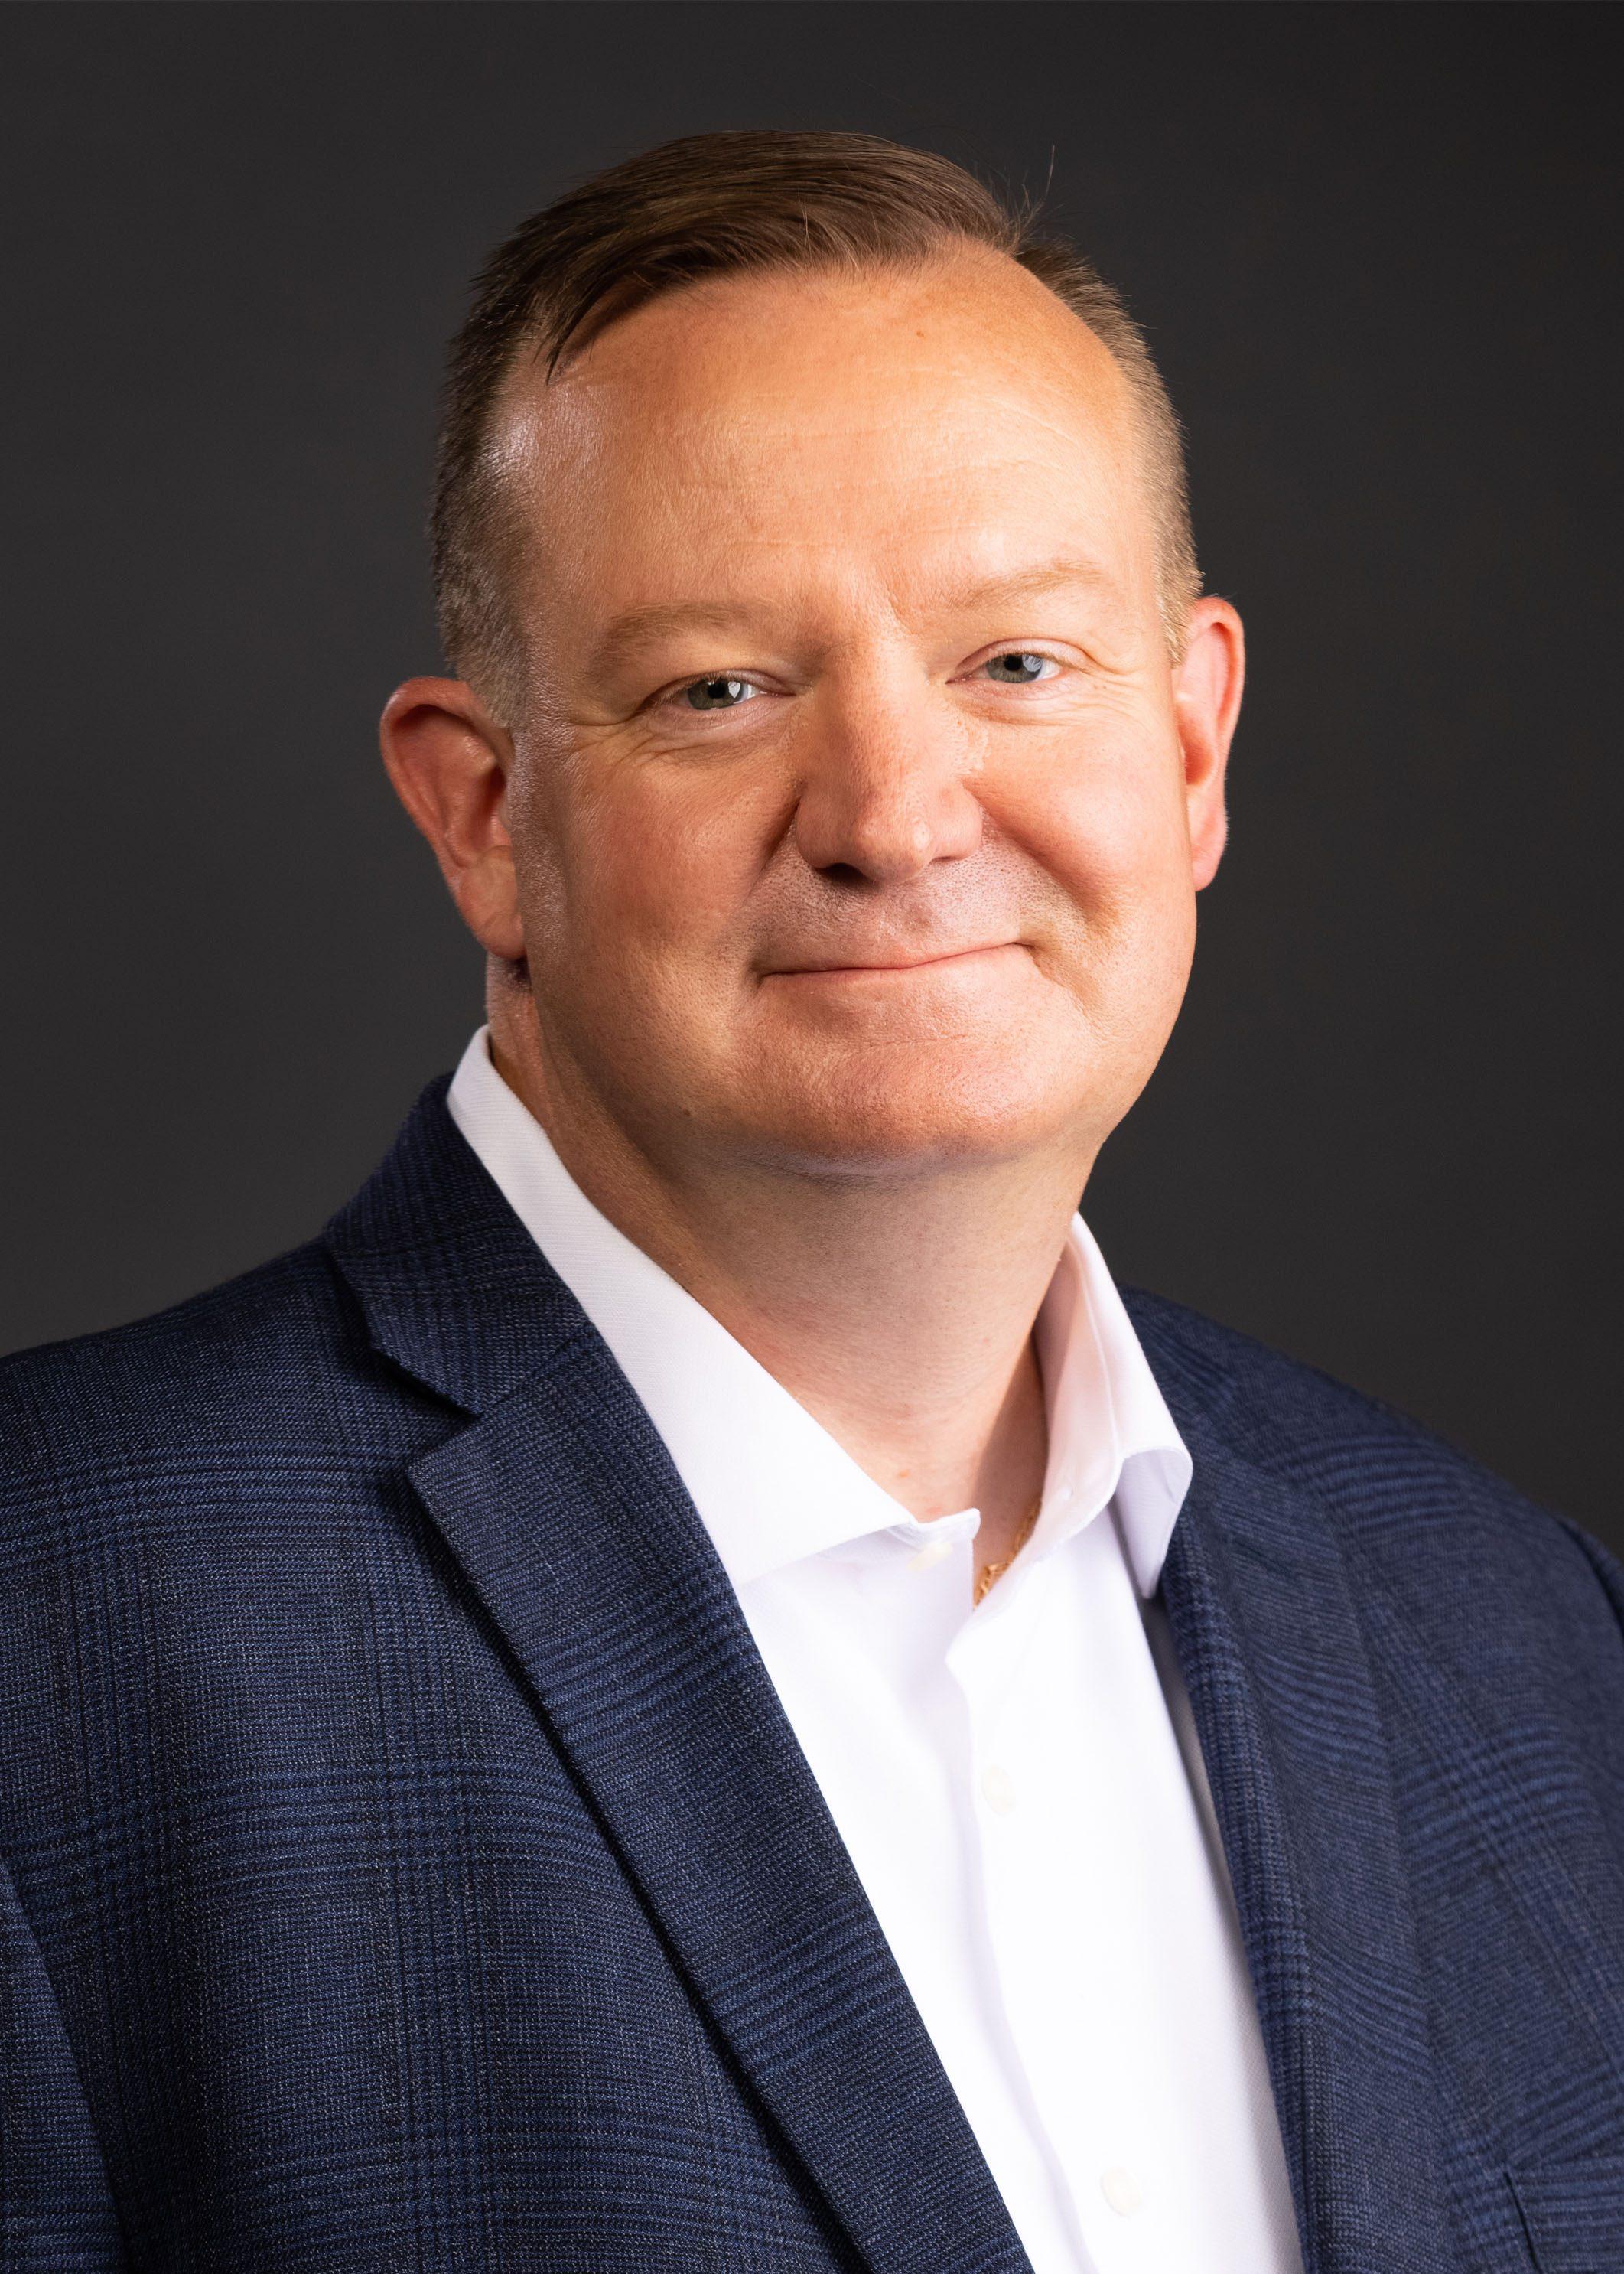 David Bullwinkle profile picture